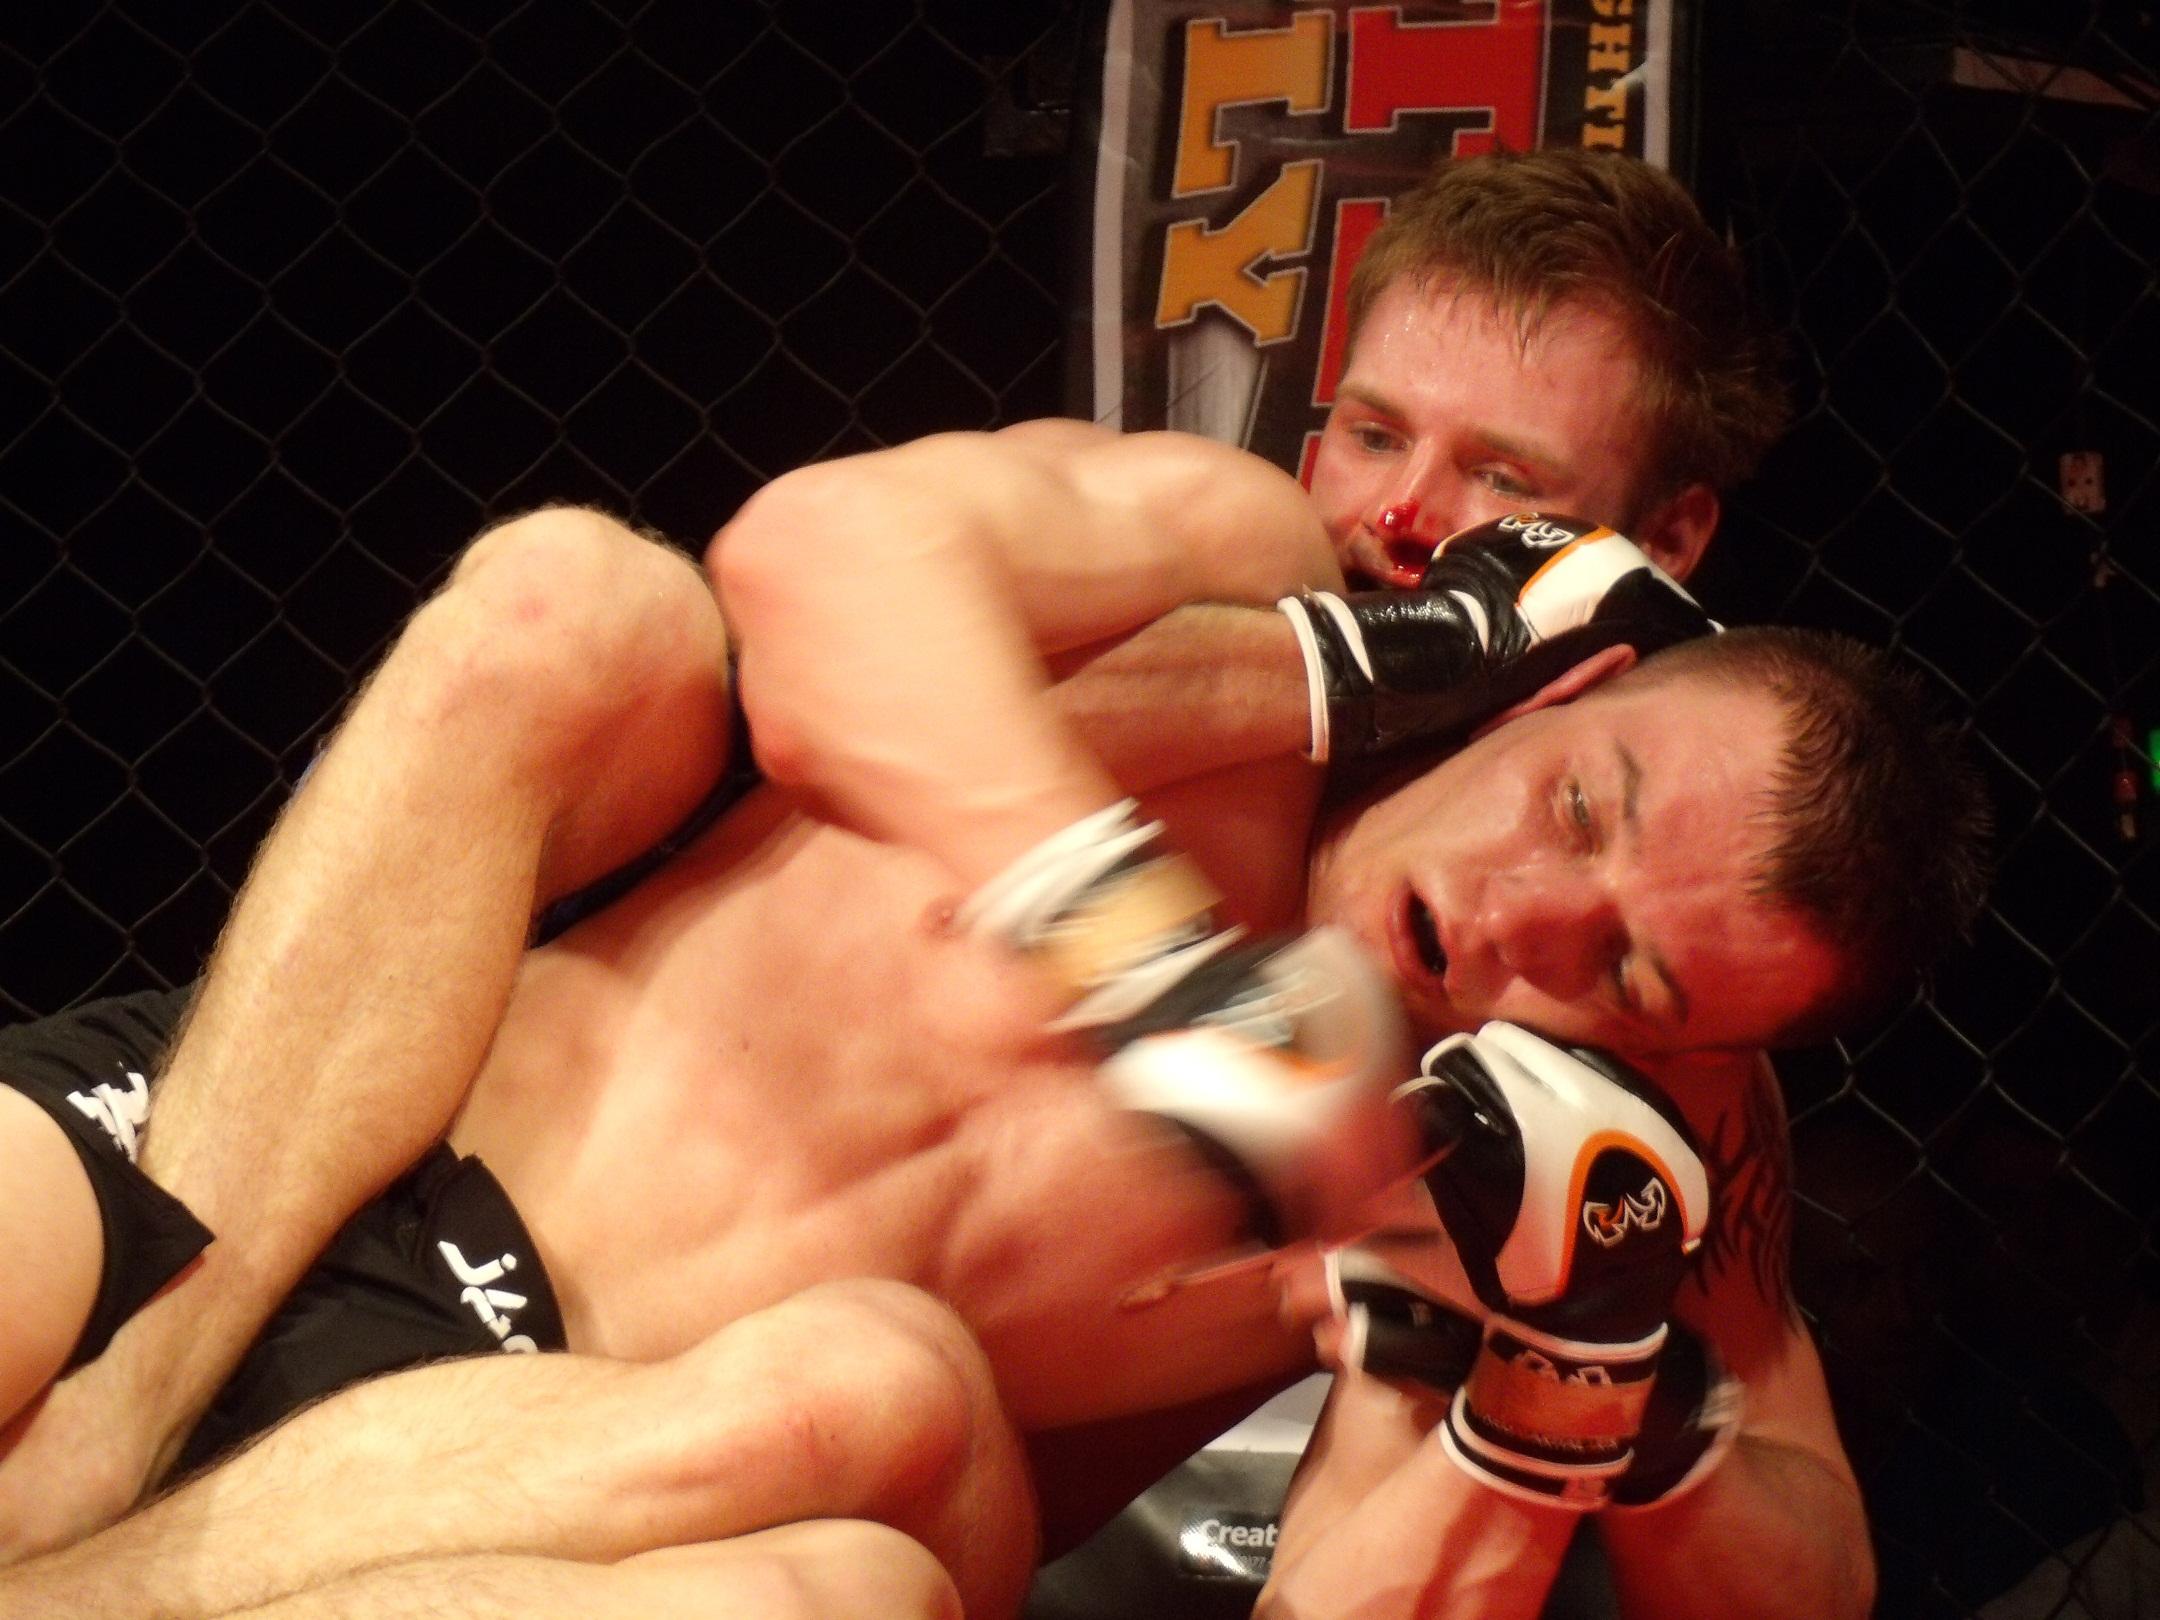 Duffy (back) Krawczyk (front)